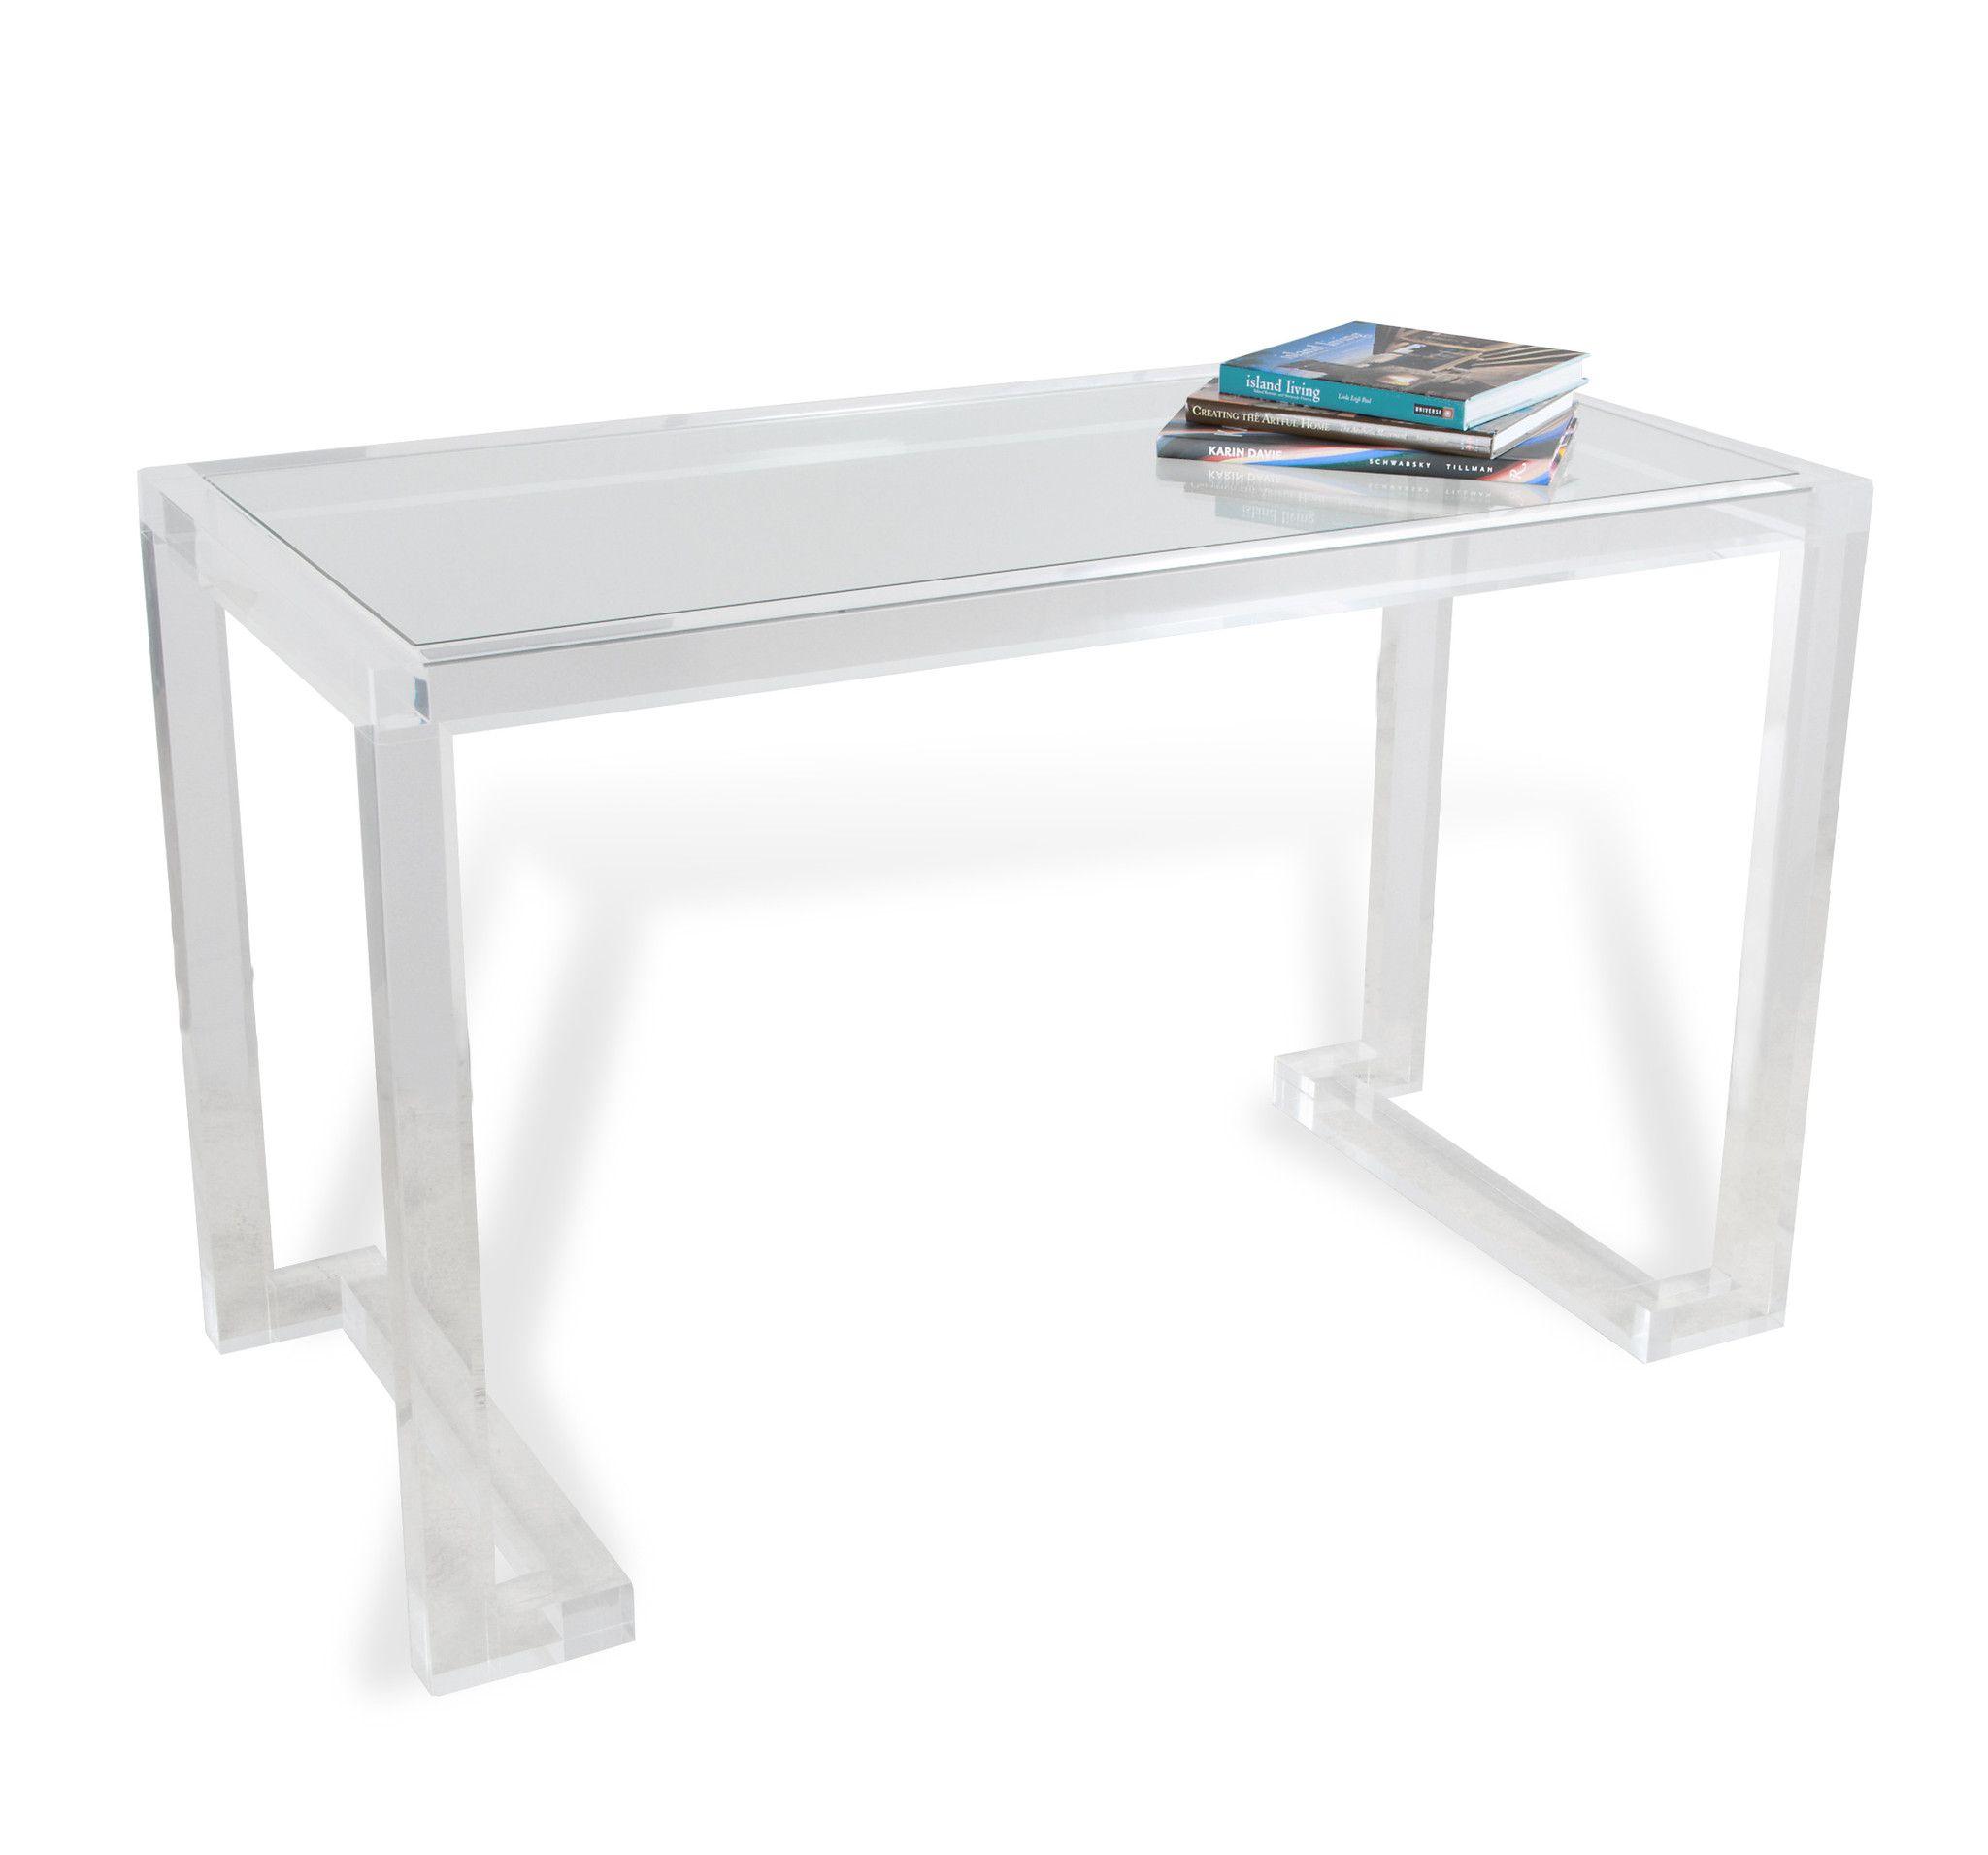 Burke Decor Furniture Acrylic Furniture Desk Design